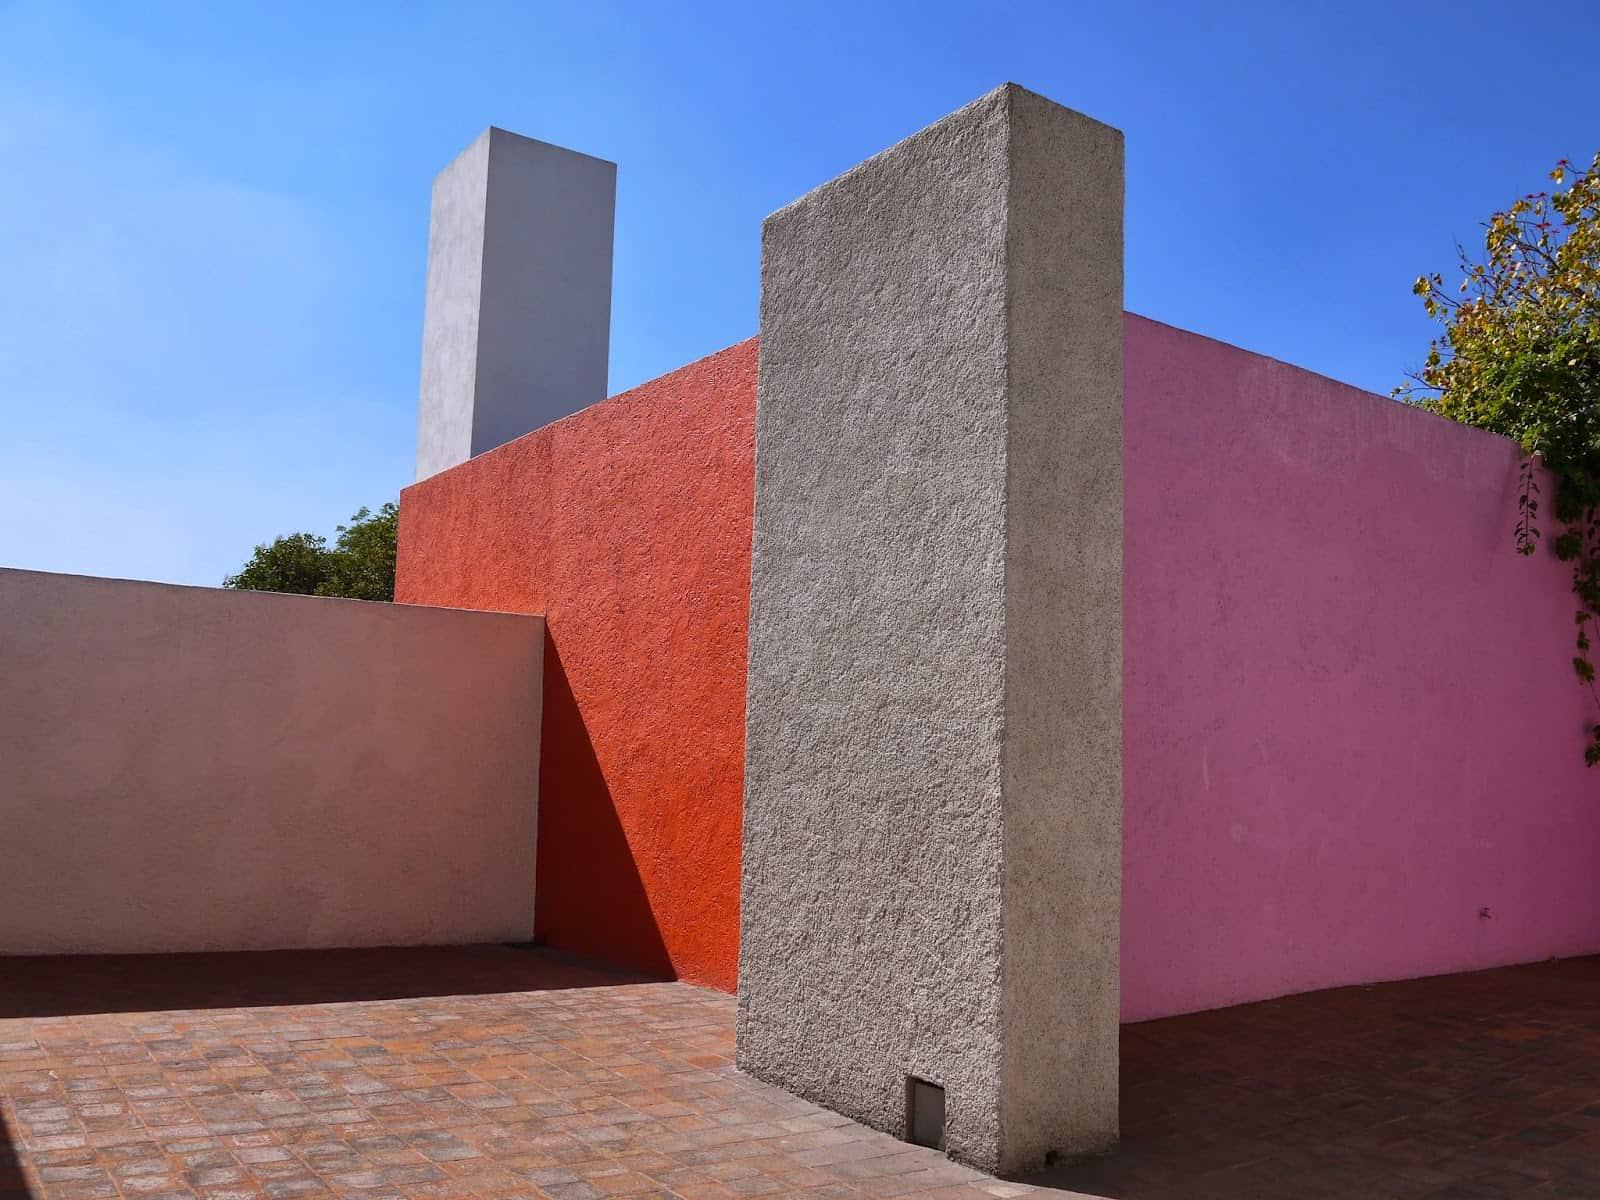 Mexico City Design Guide mexico city design guide Mexico City Design Guide P1120833 min